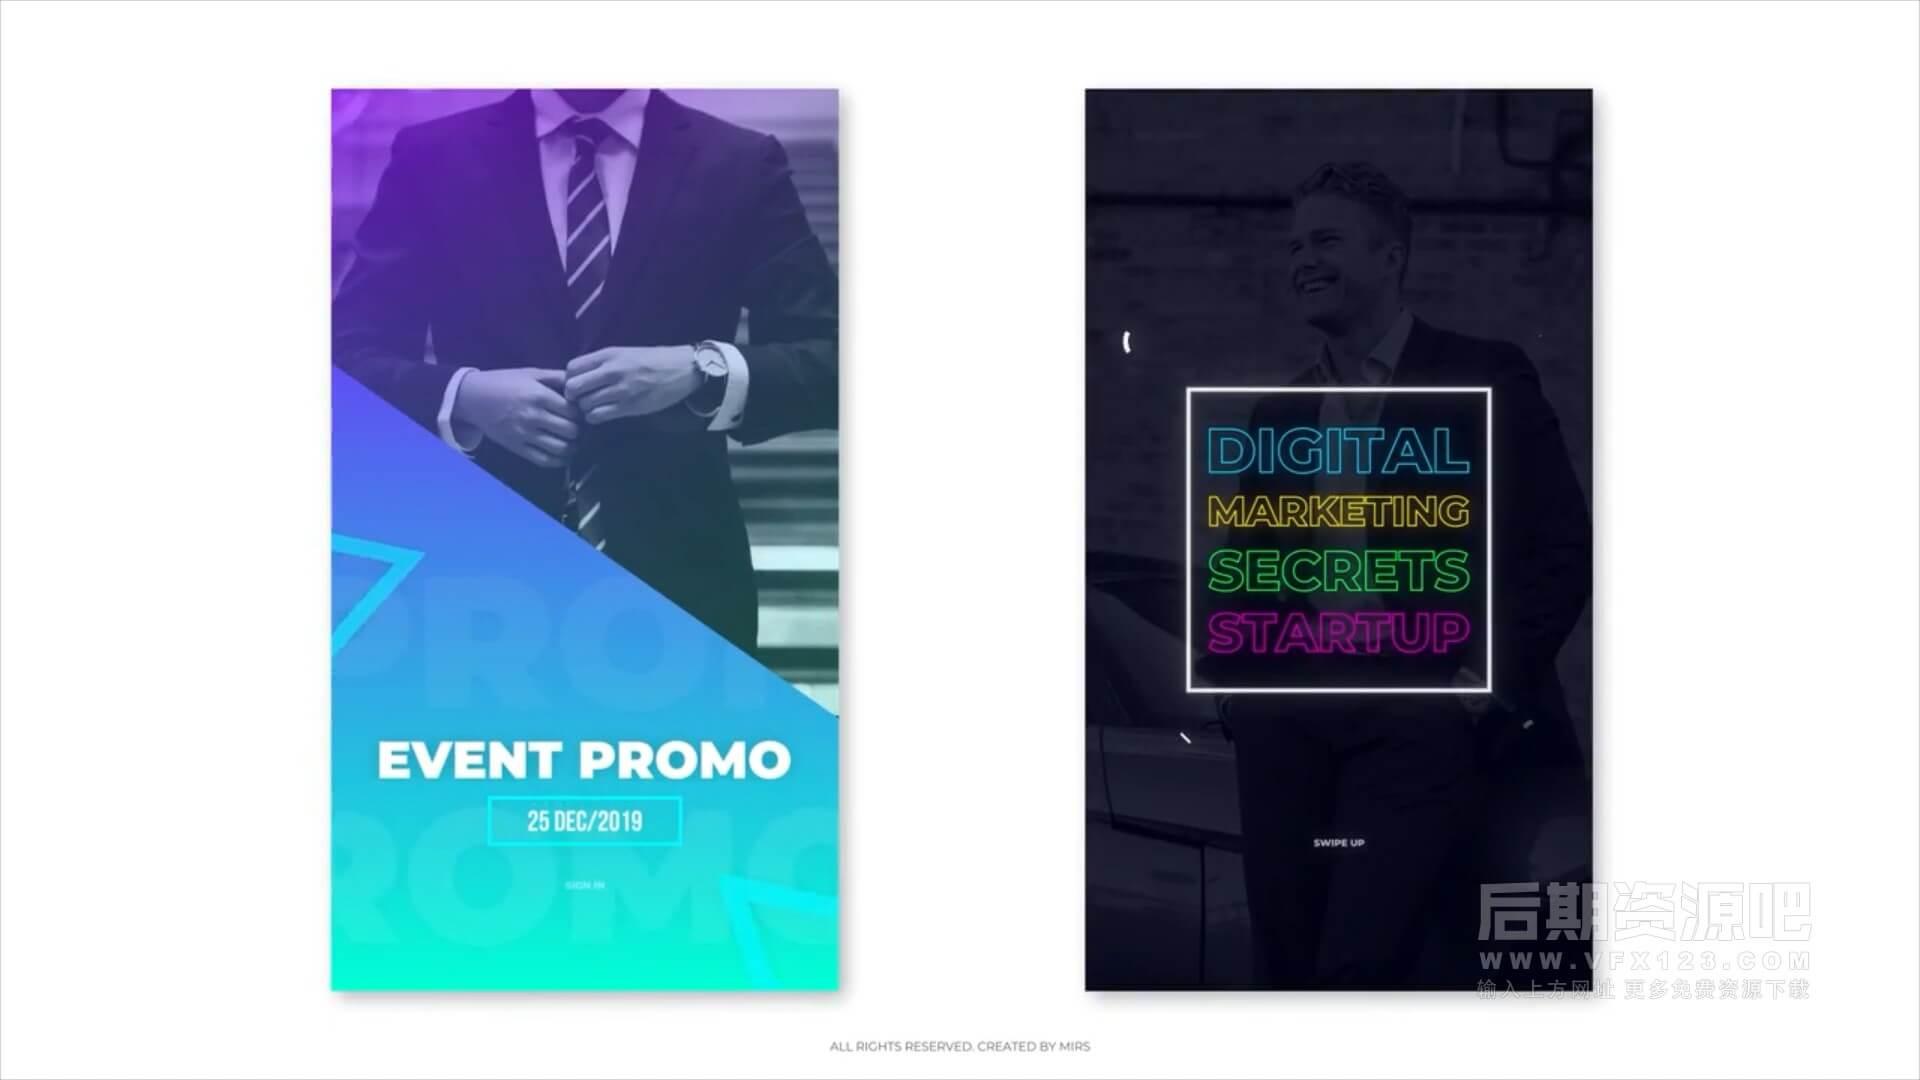 fcpx插件 商务风格简洁干净竖屏模板 Ins Stories Corporate